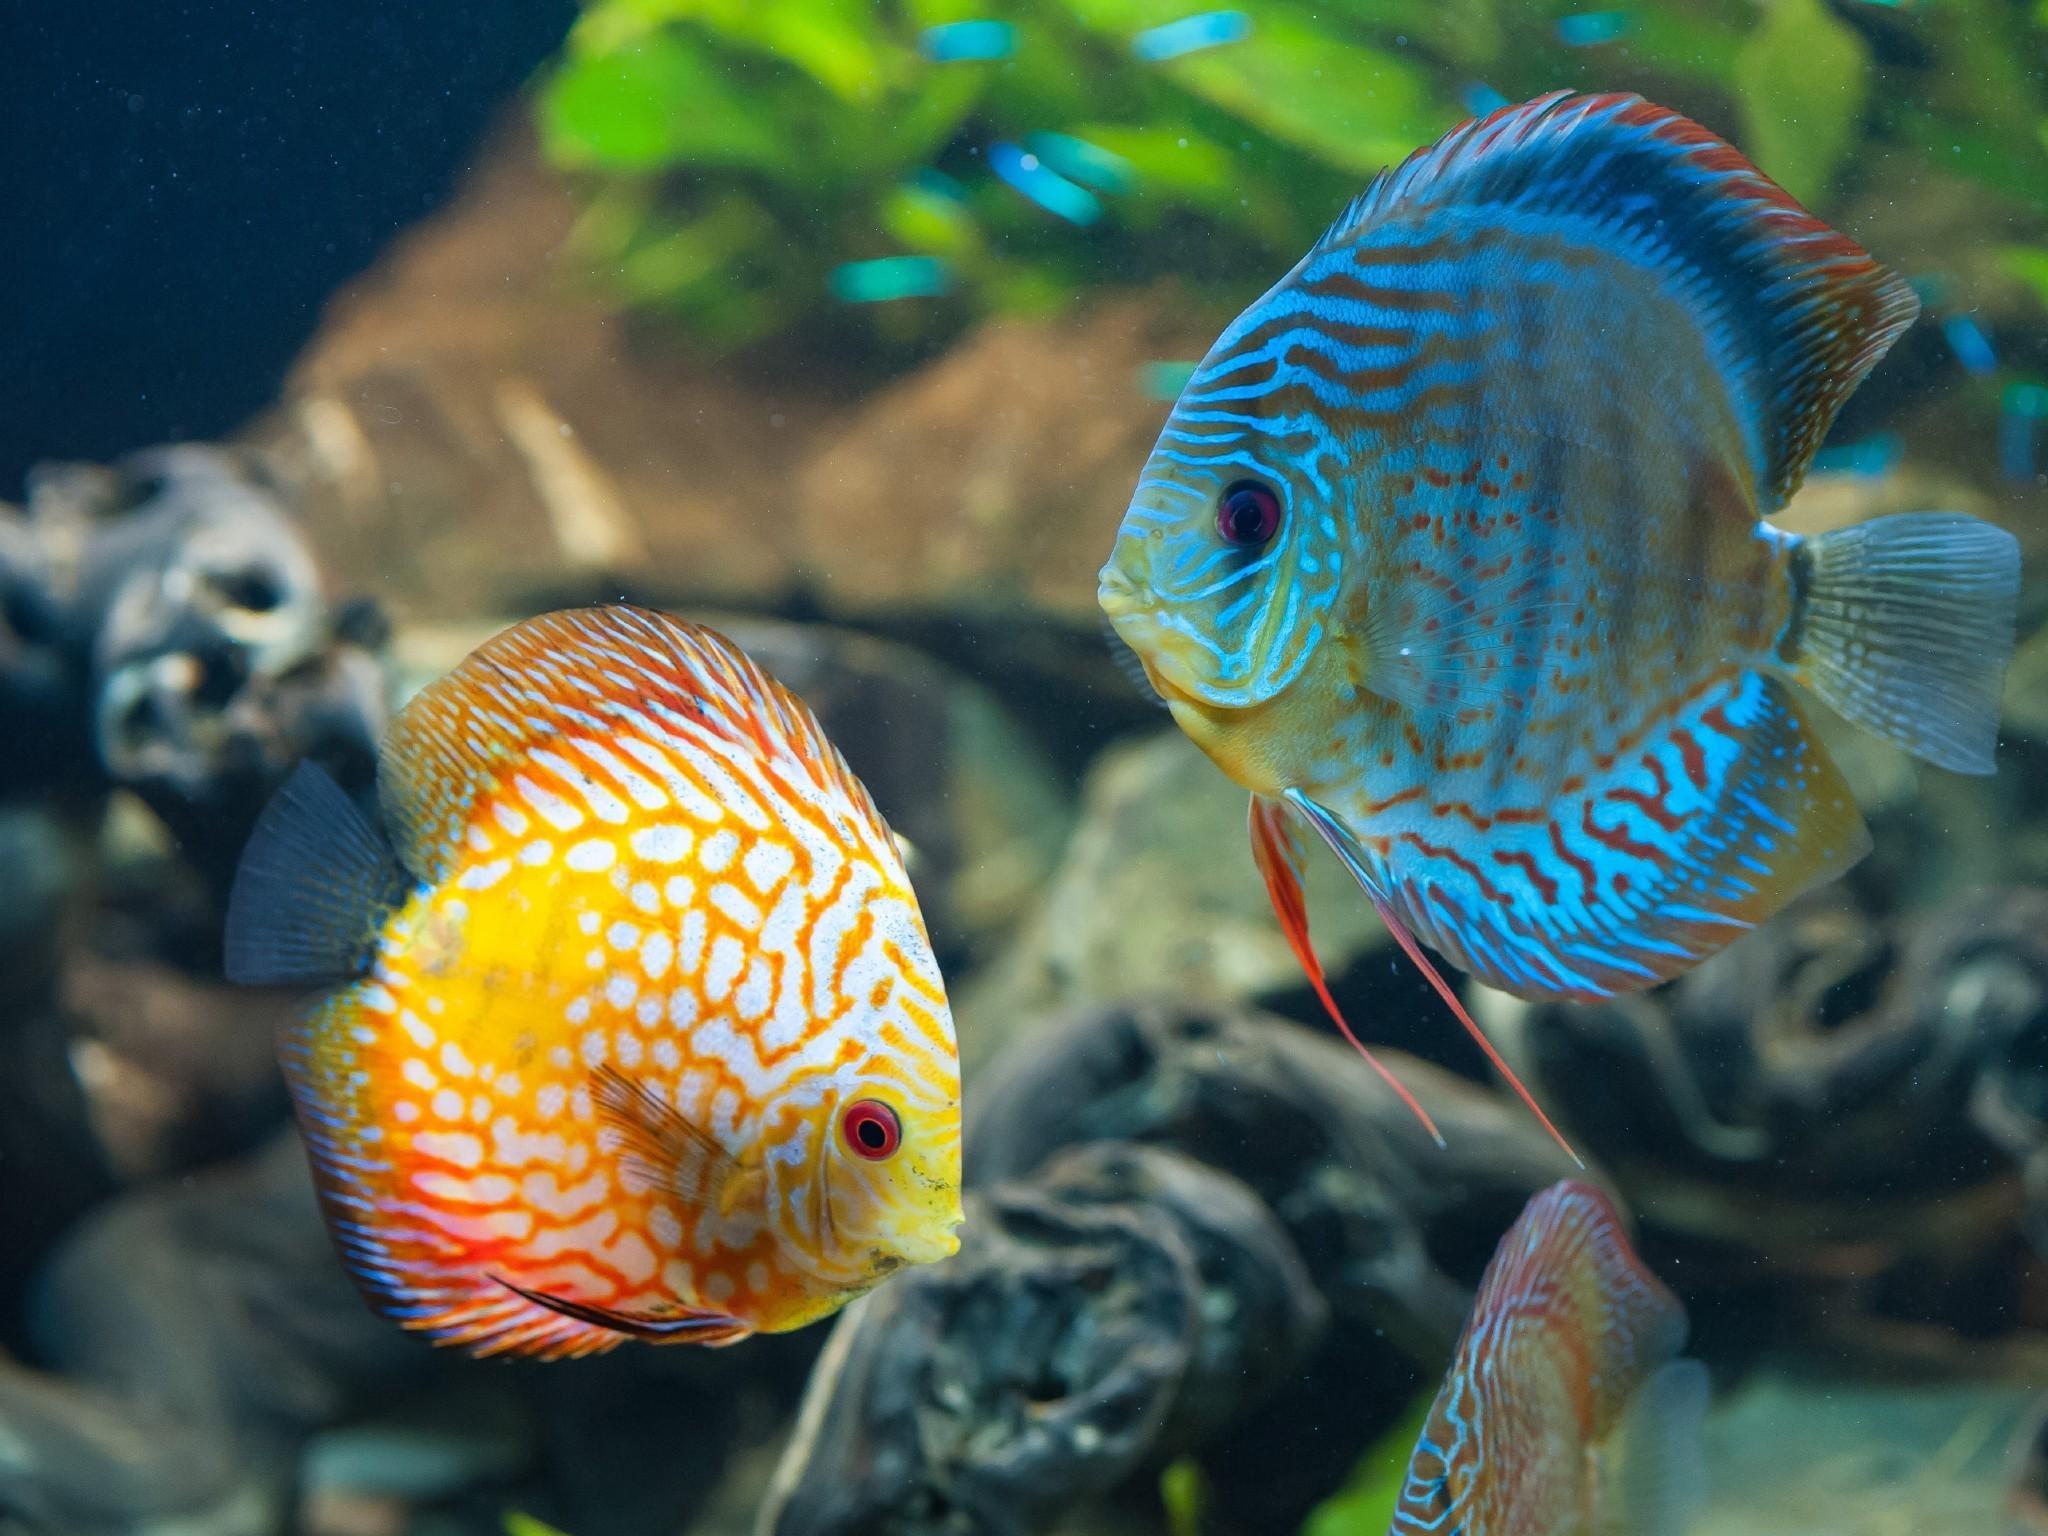 Sfondi 2048x1536 px animali discus pesce pesce for Pesce discus